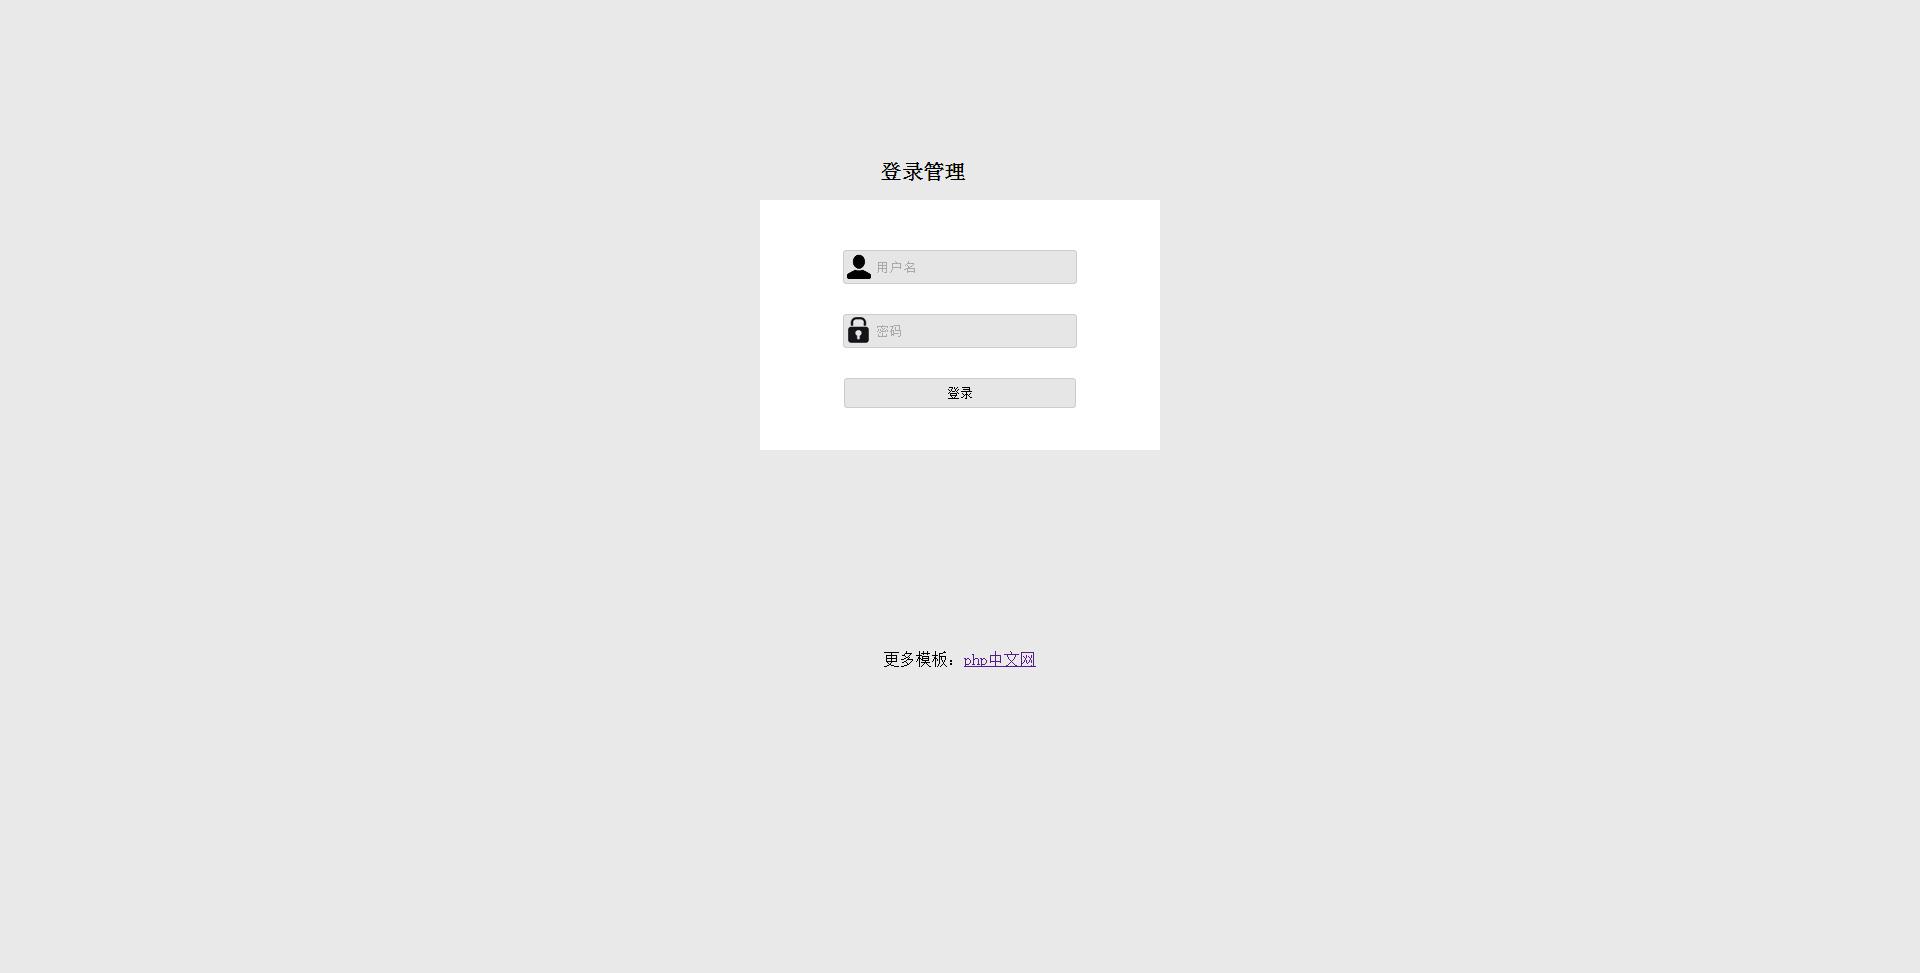 DIV+CSS简单登录界面模板